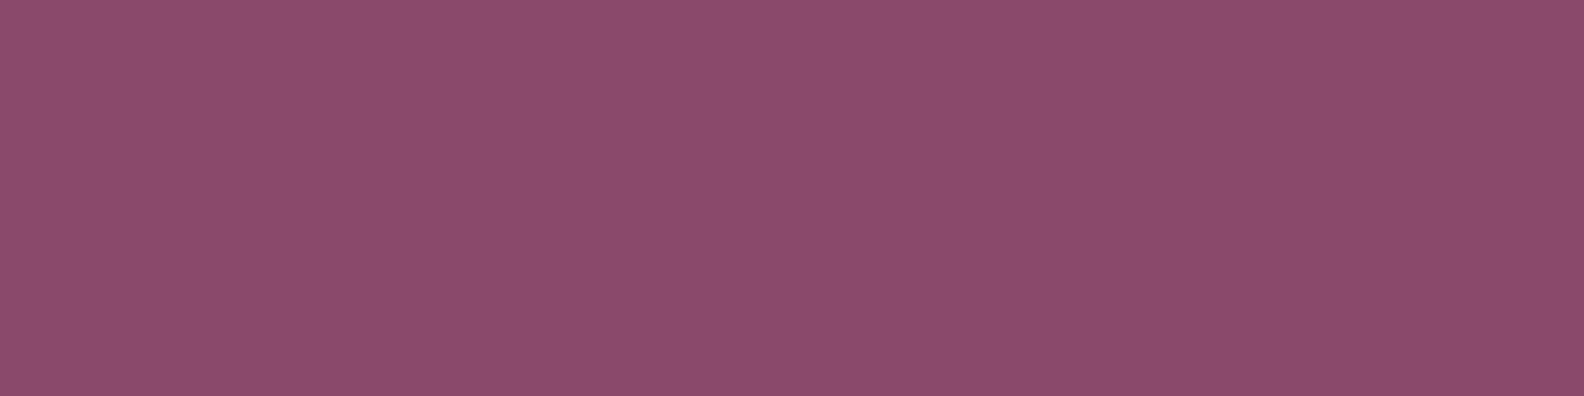 1584x396 Twilight Lavender Solid Color Background